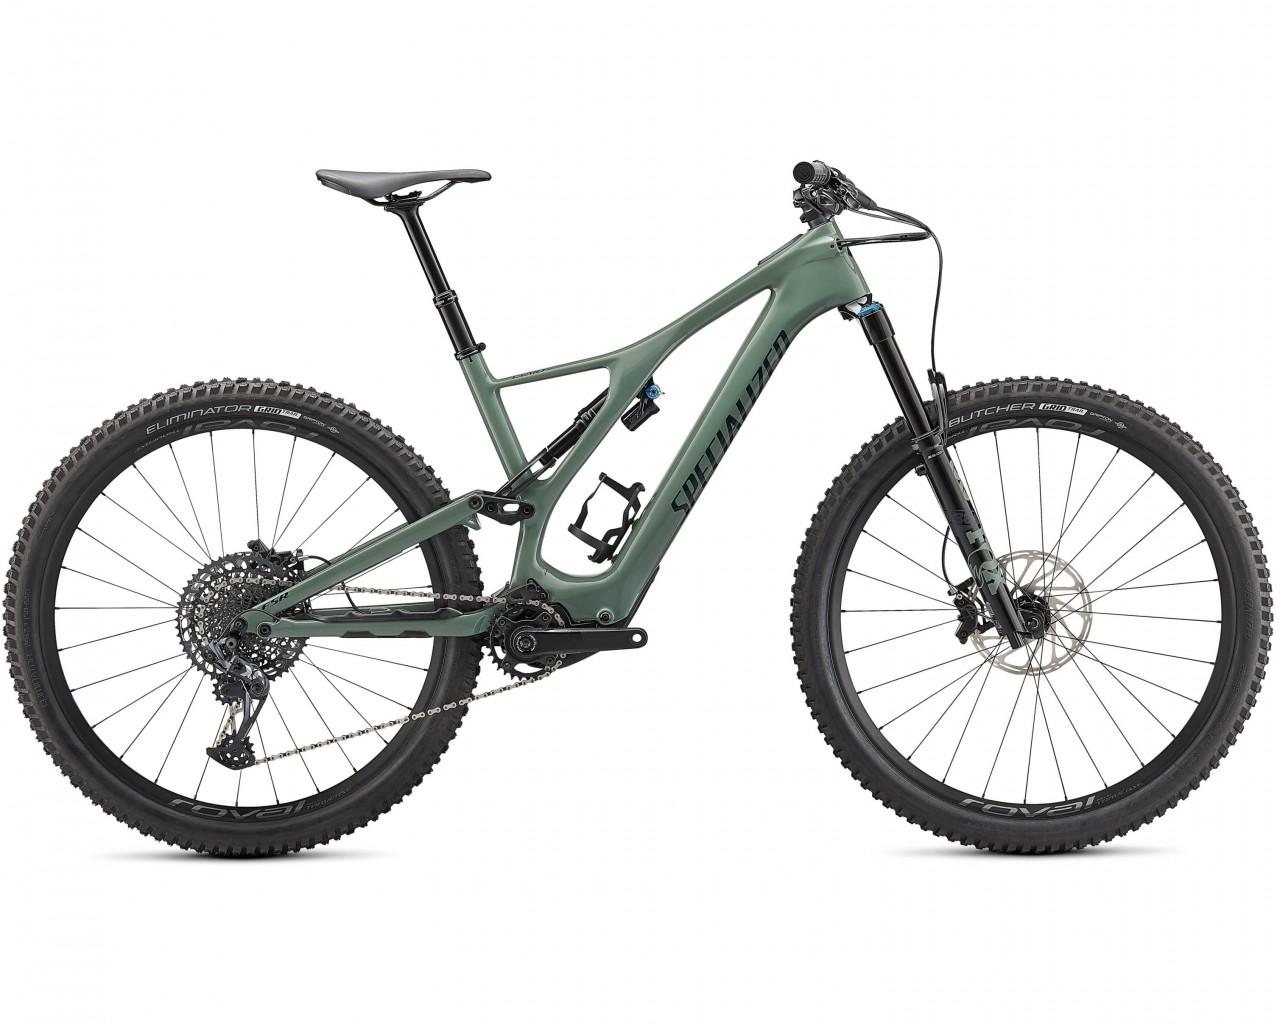 Specialized Levo SL Expert Carbon 29 - Pedelec Carbon Mountain Bike Fullsuspension 2021   gloss sage-forst green